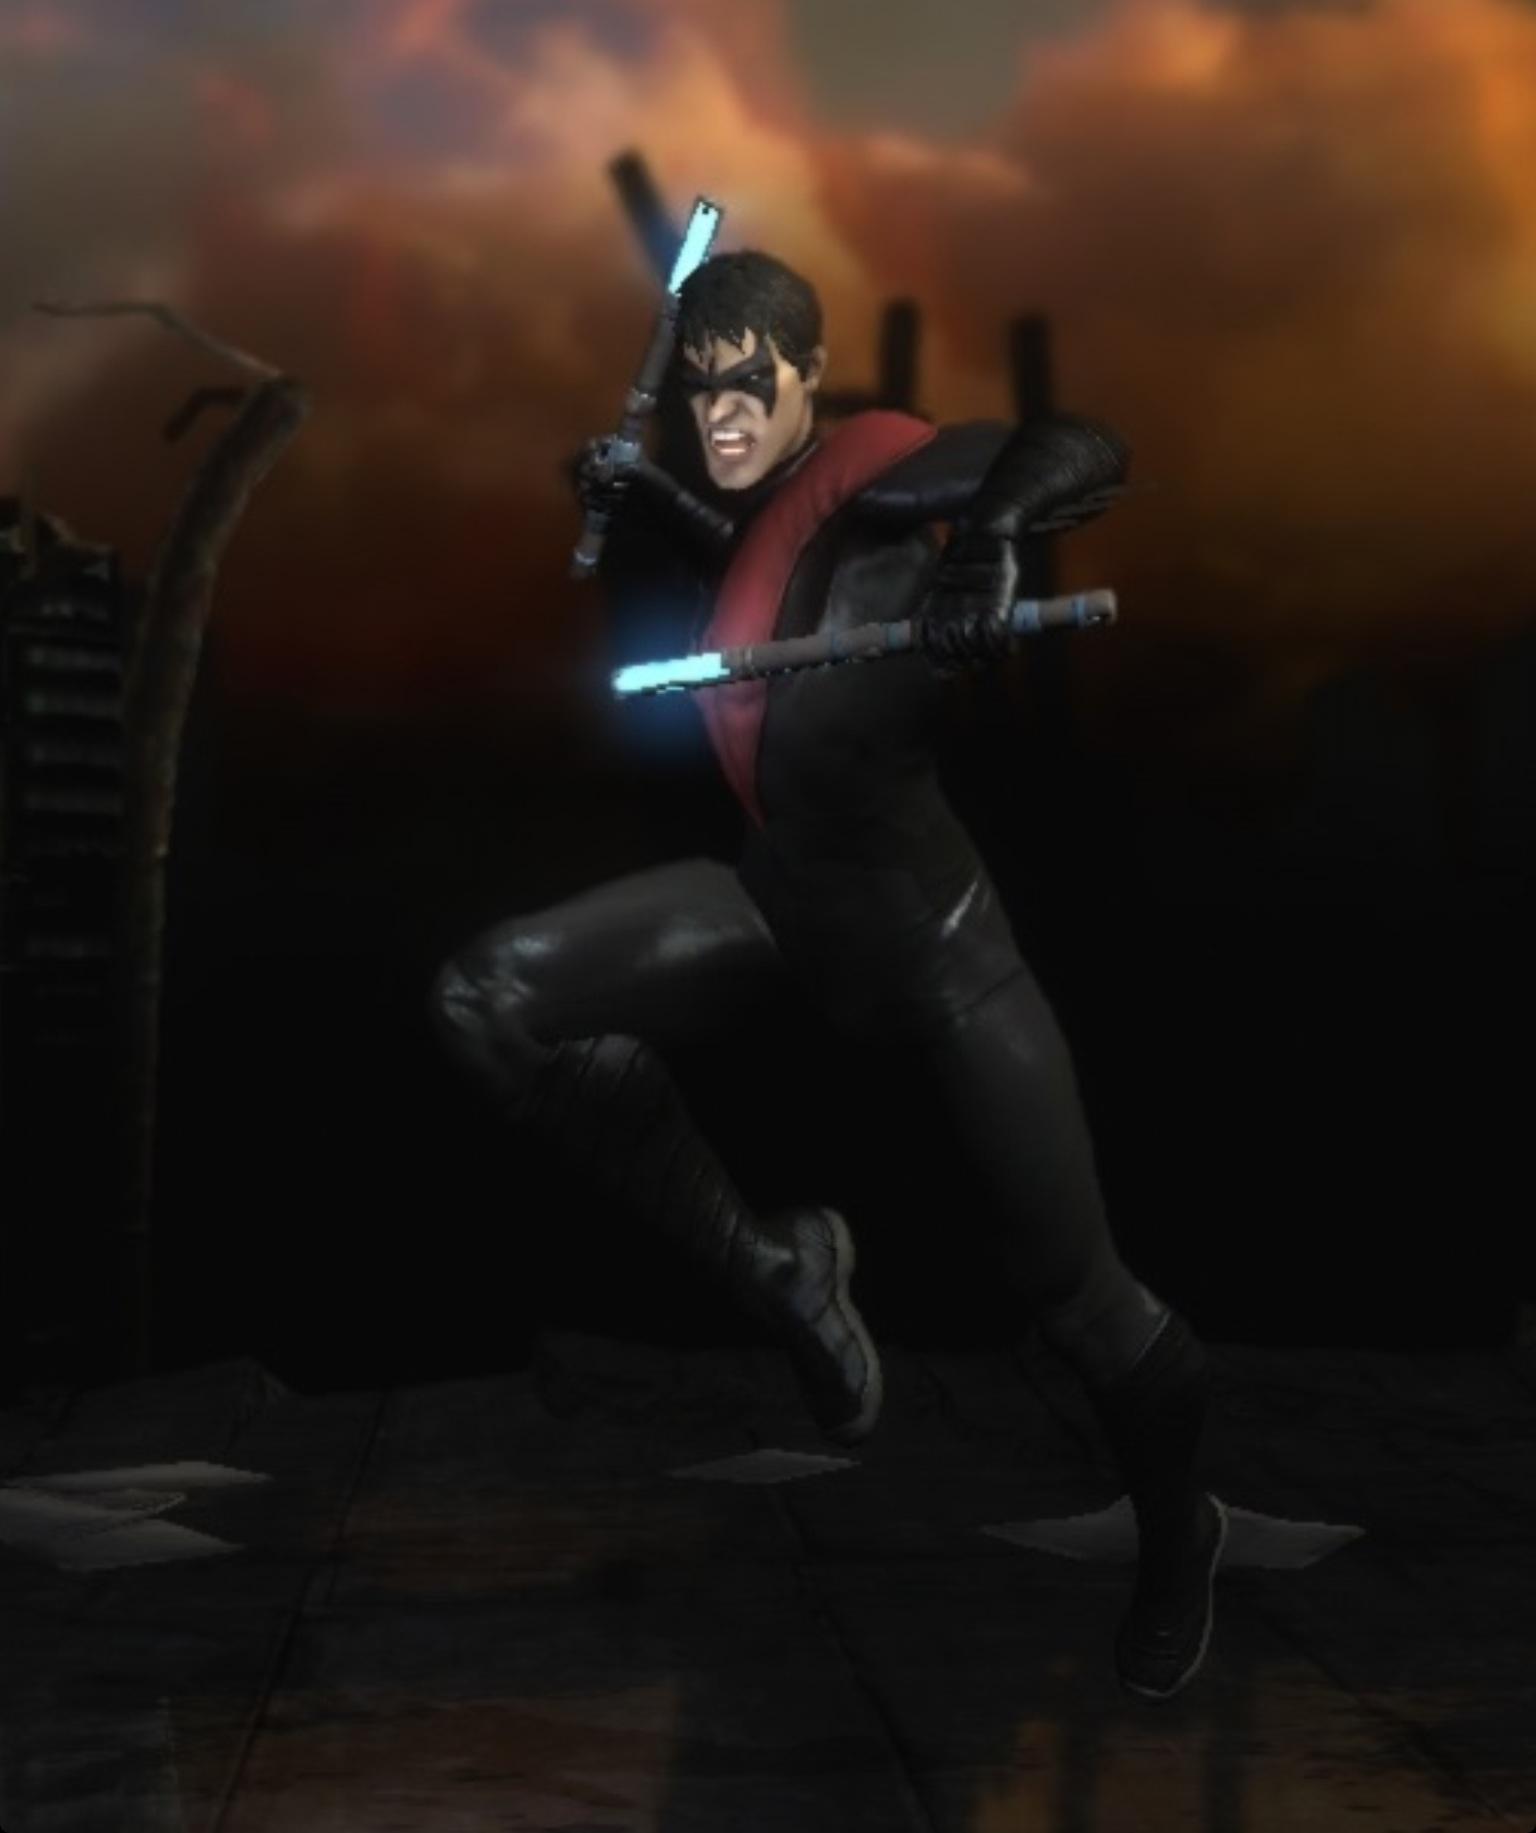 Image - Nightwing New 52.jpg - Injustice:Gods Among Us Wiki New 52 Joker Injustice